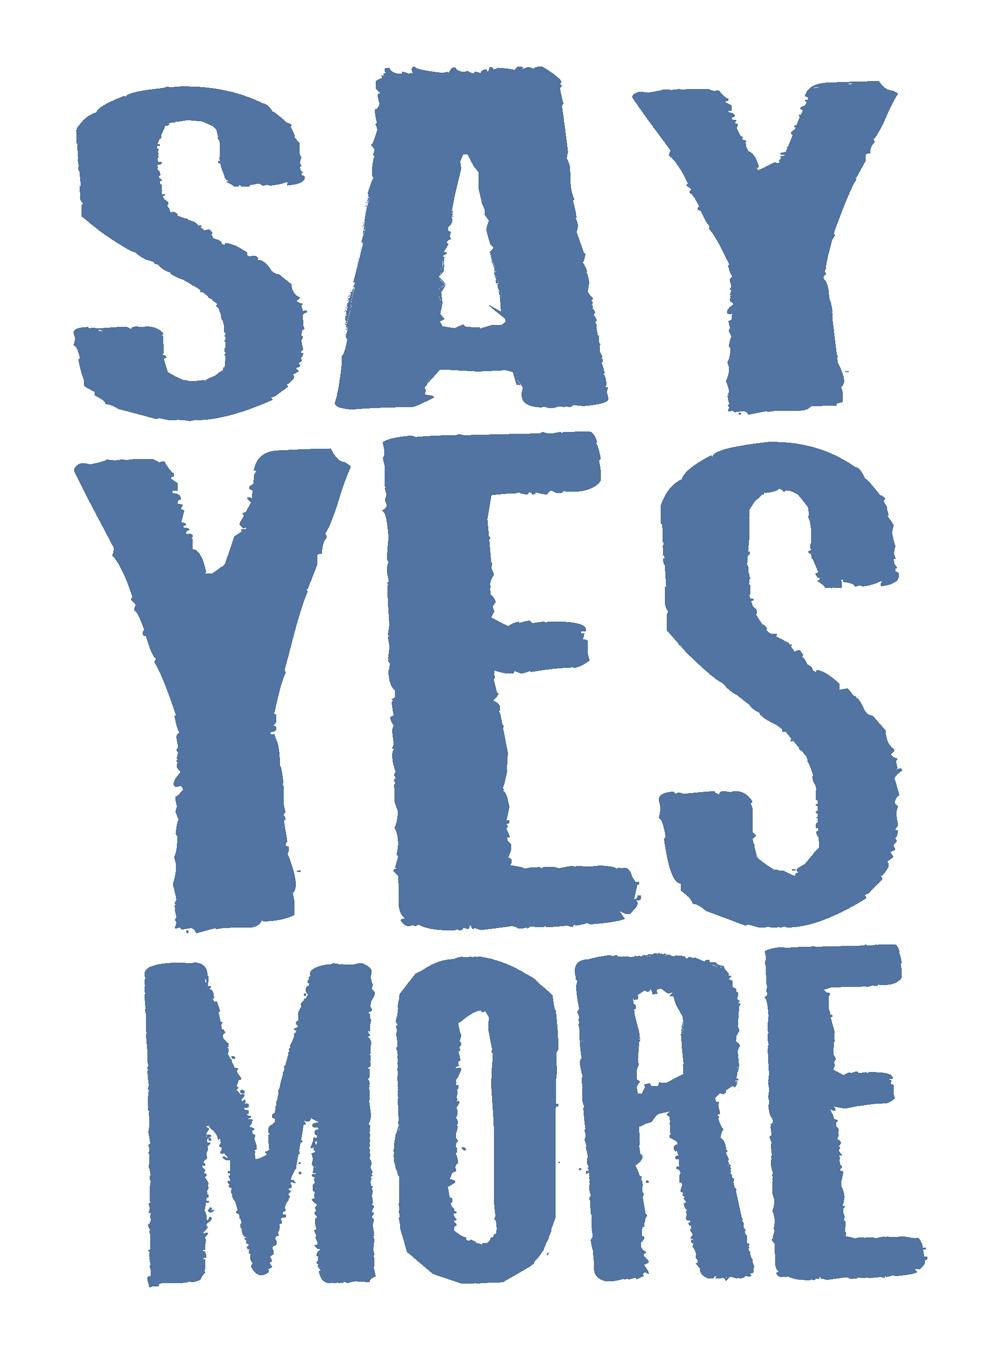 www.sayyesmore.com